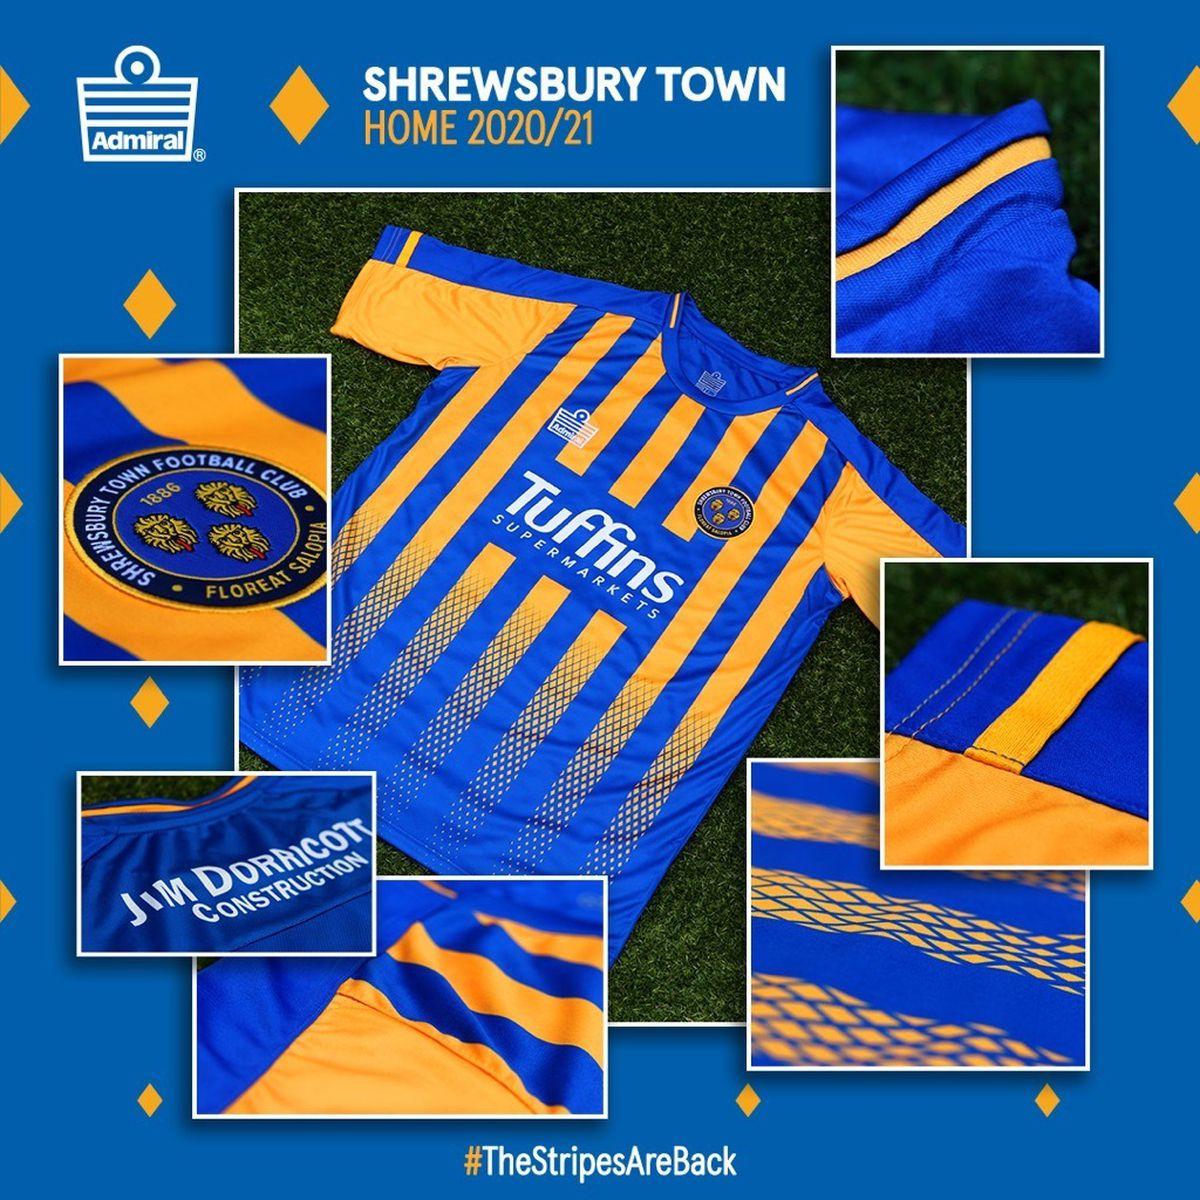 Shrewsbury Town reveal new kit for the 2020/21 season